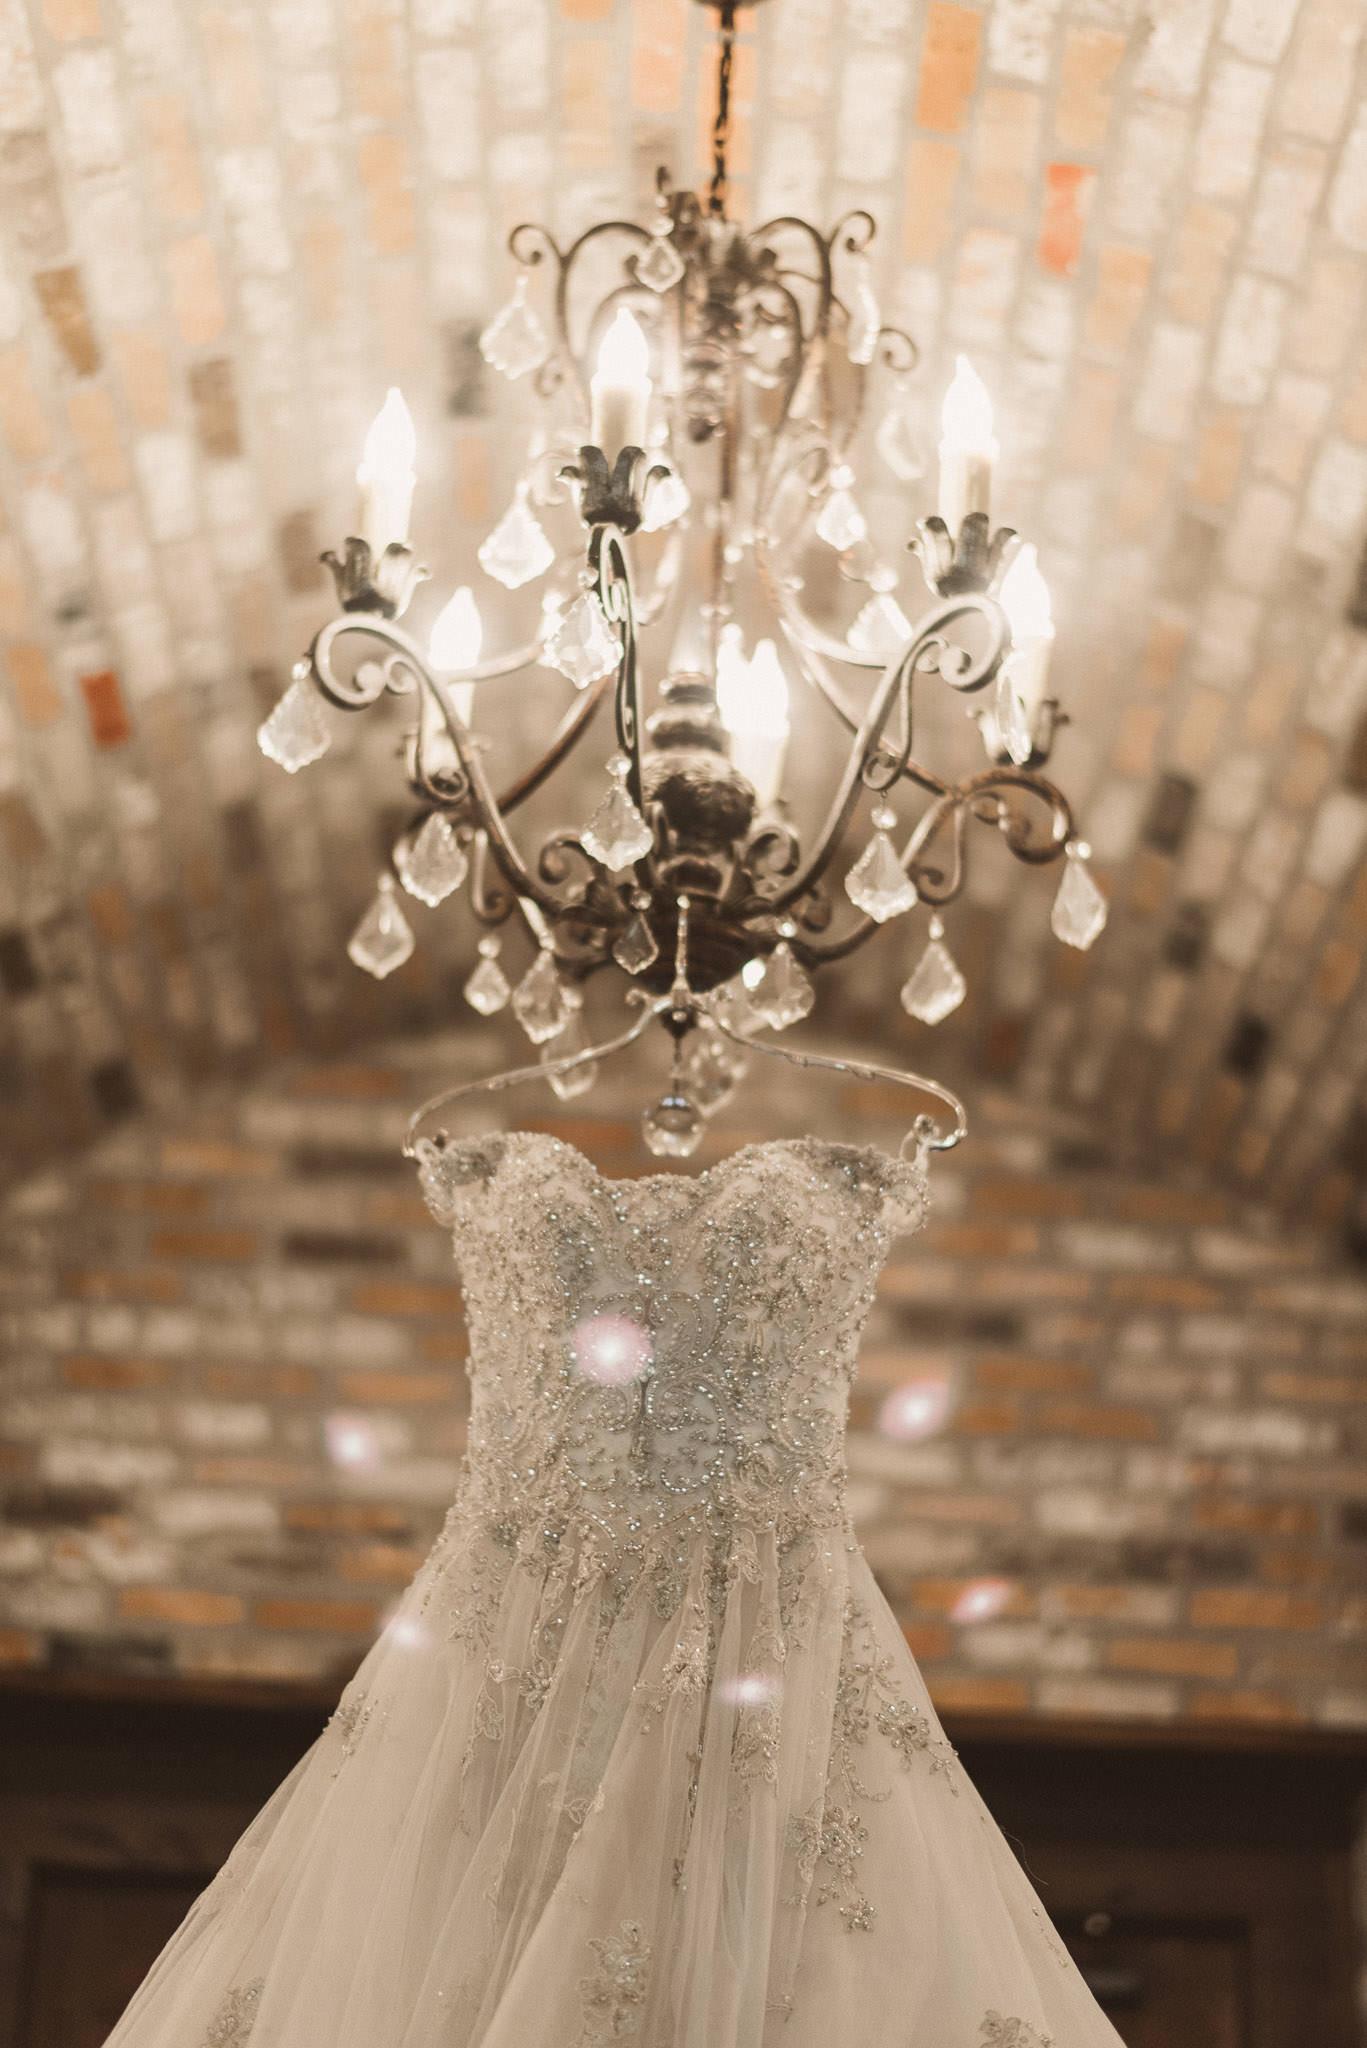 adriana-christian-wedding-re-sm-19.jpg